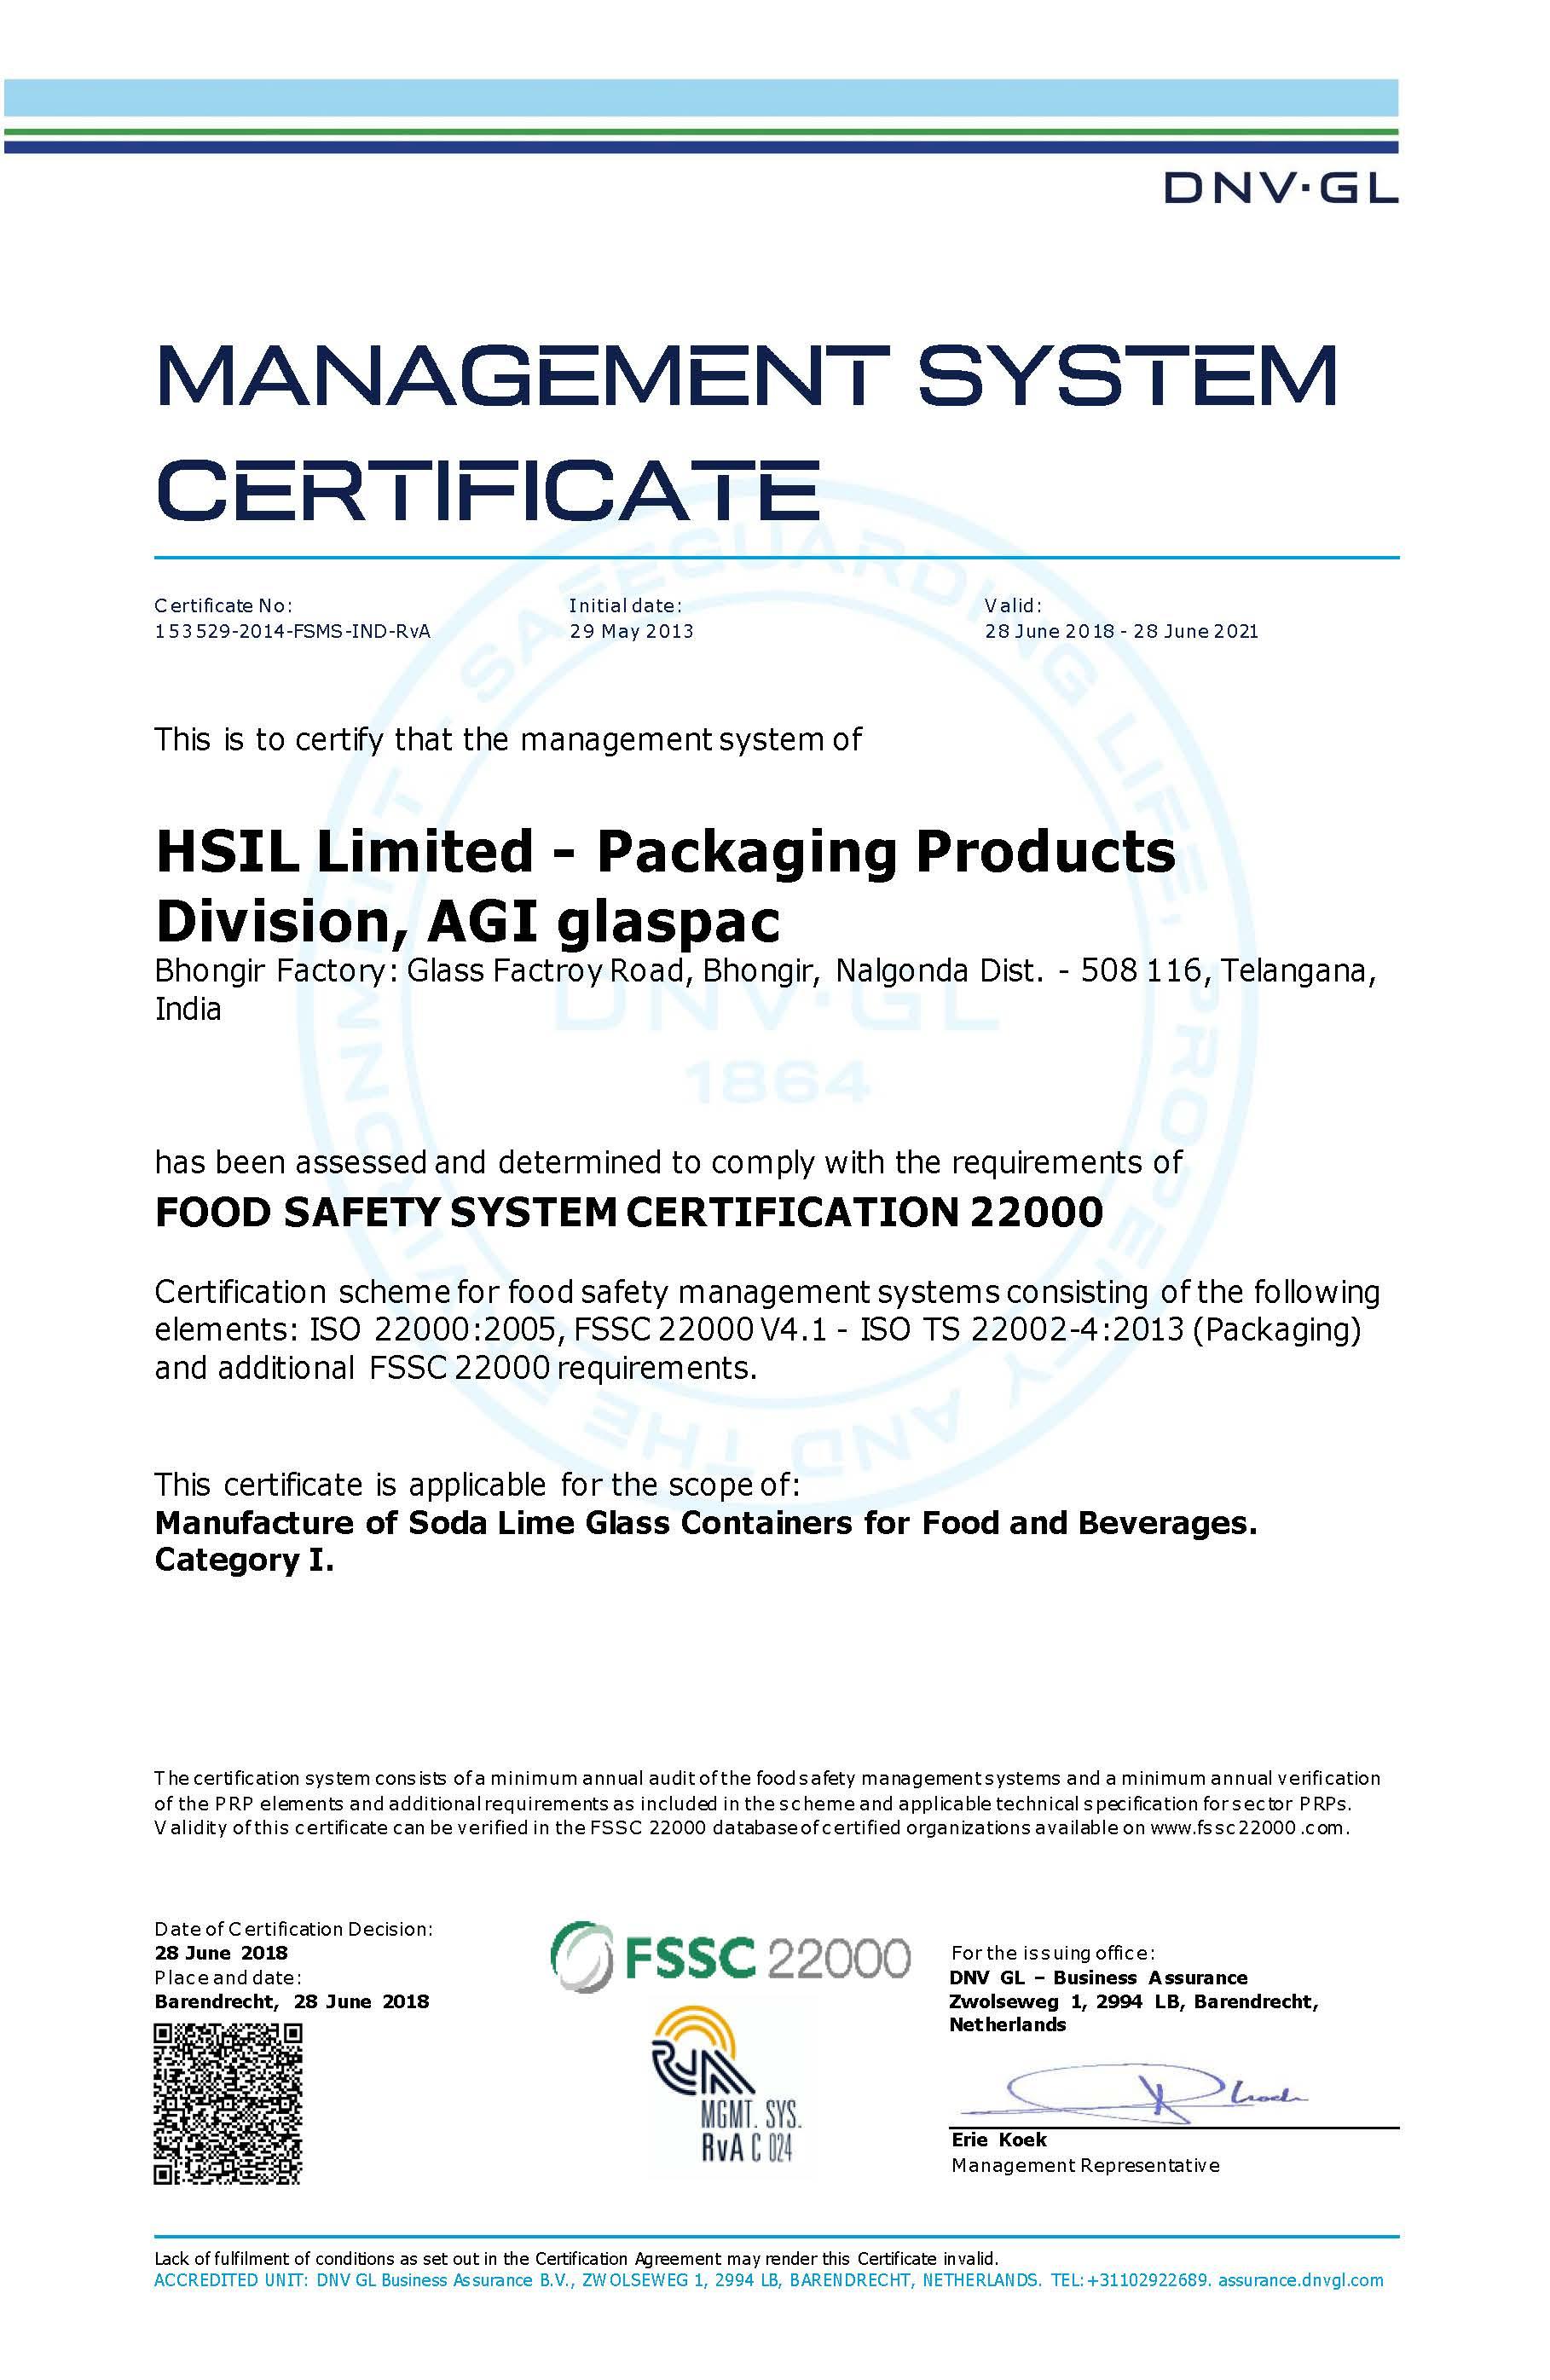 Bgr Certificate 1